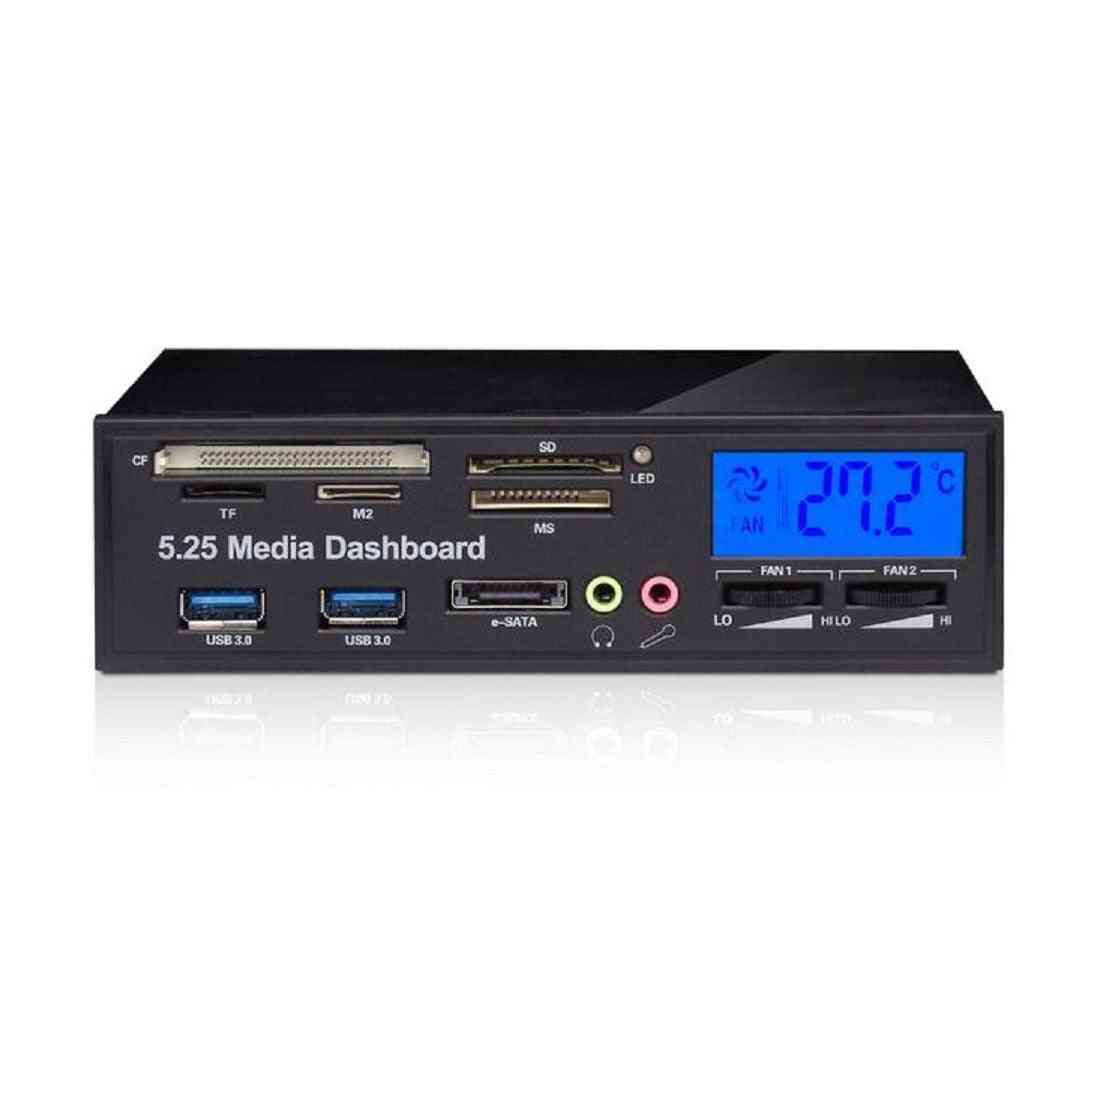 Multifunctional Media Panel- 5.25 Inch Dashboard